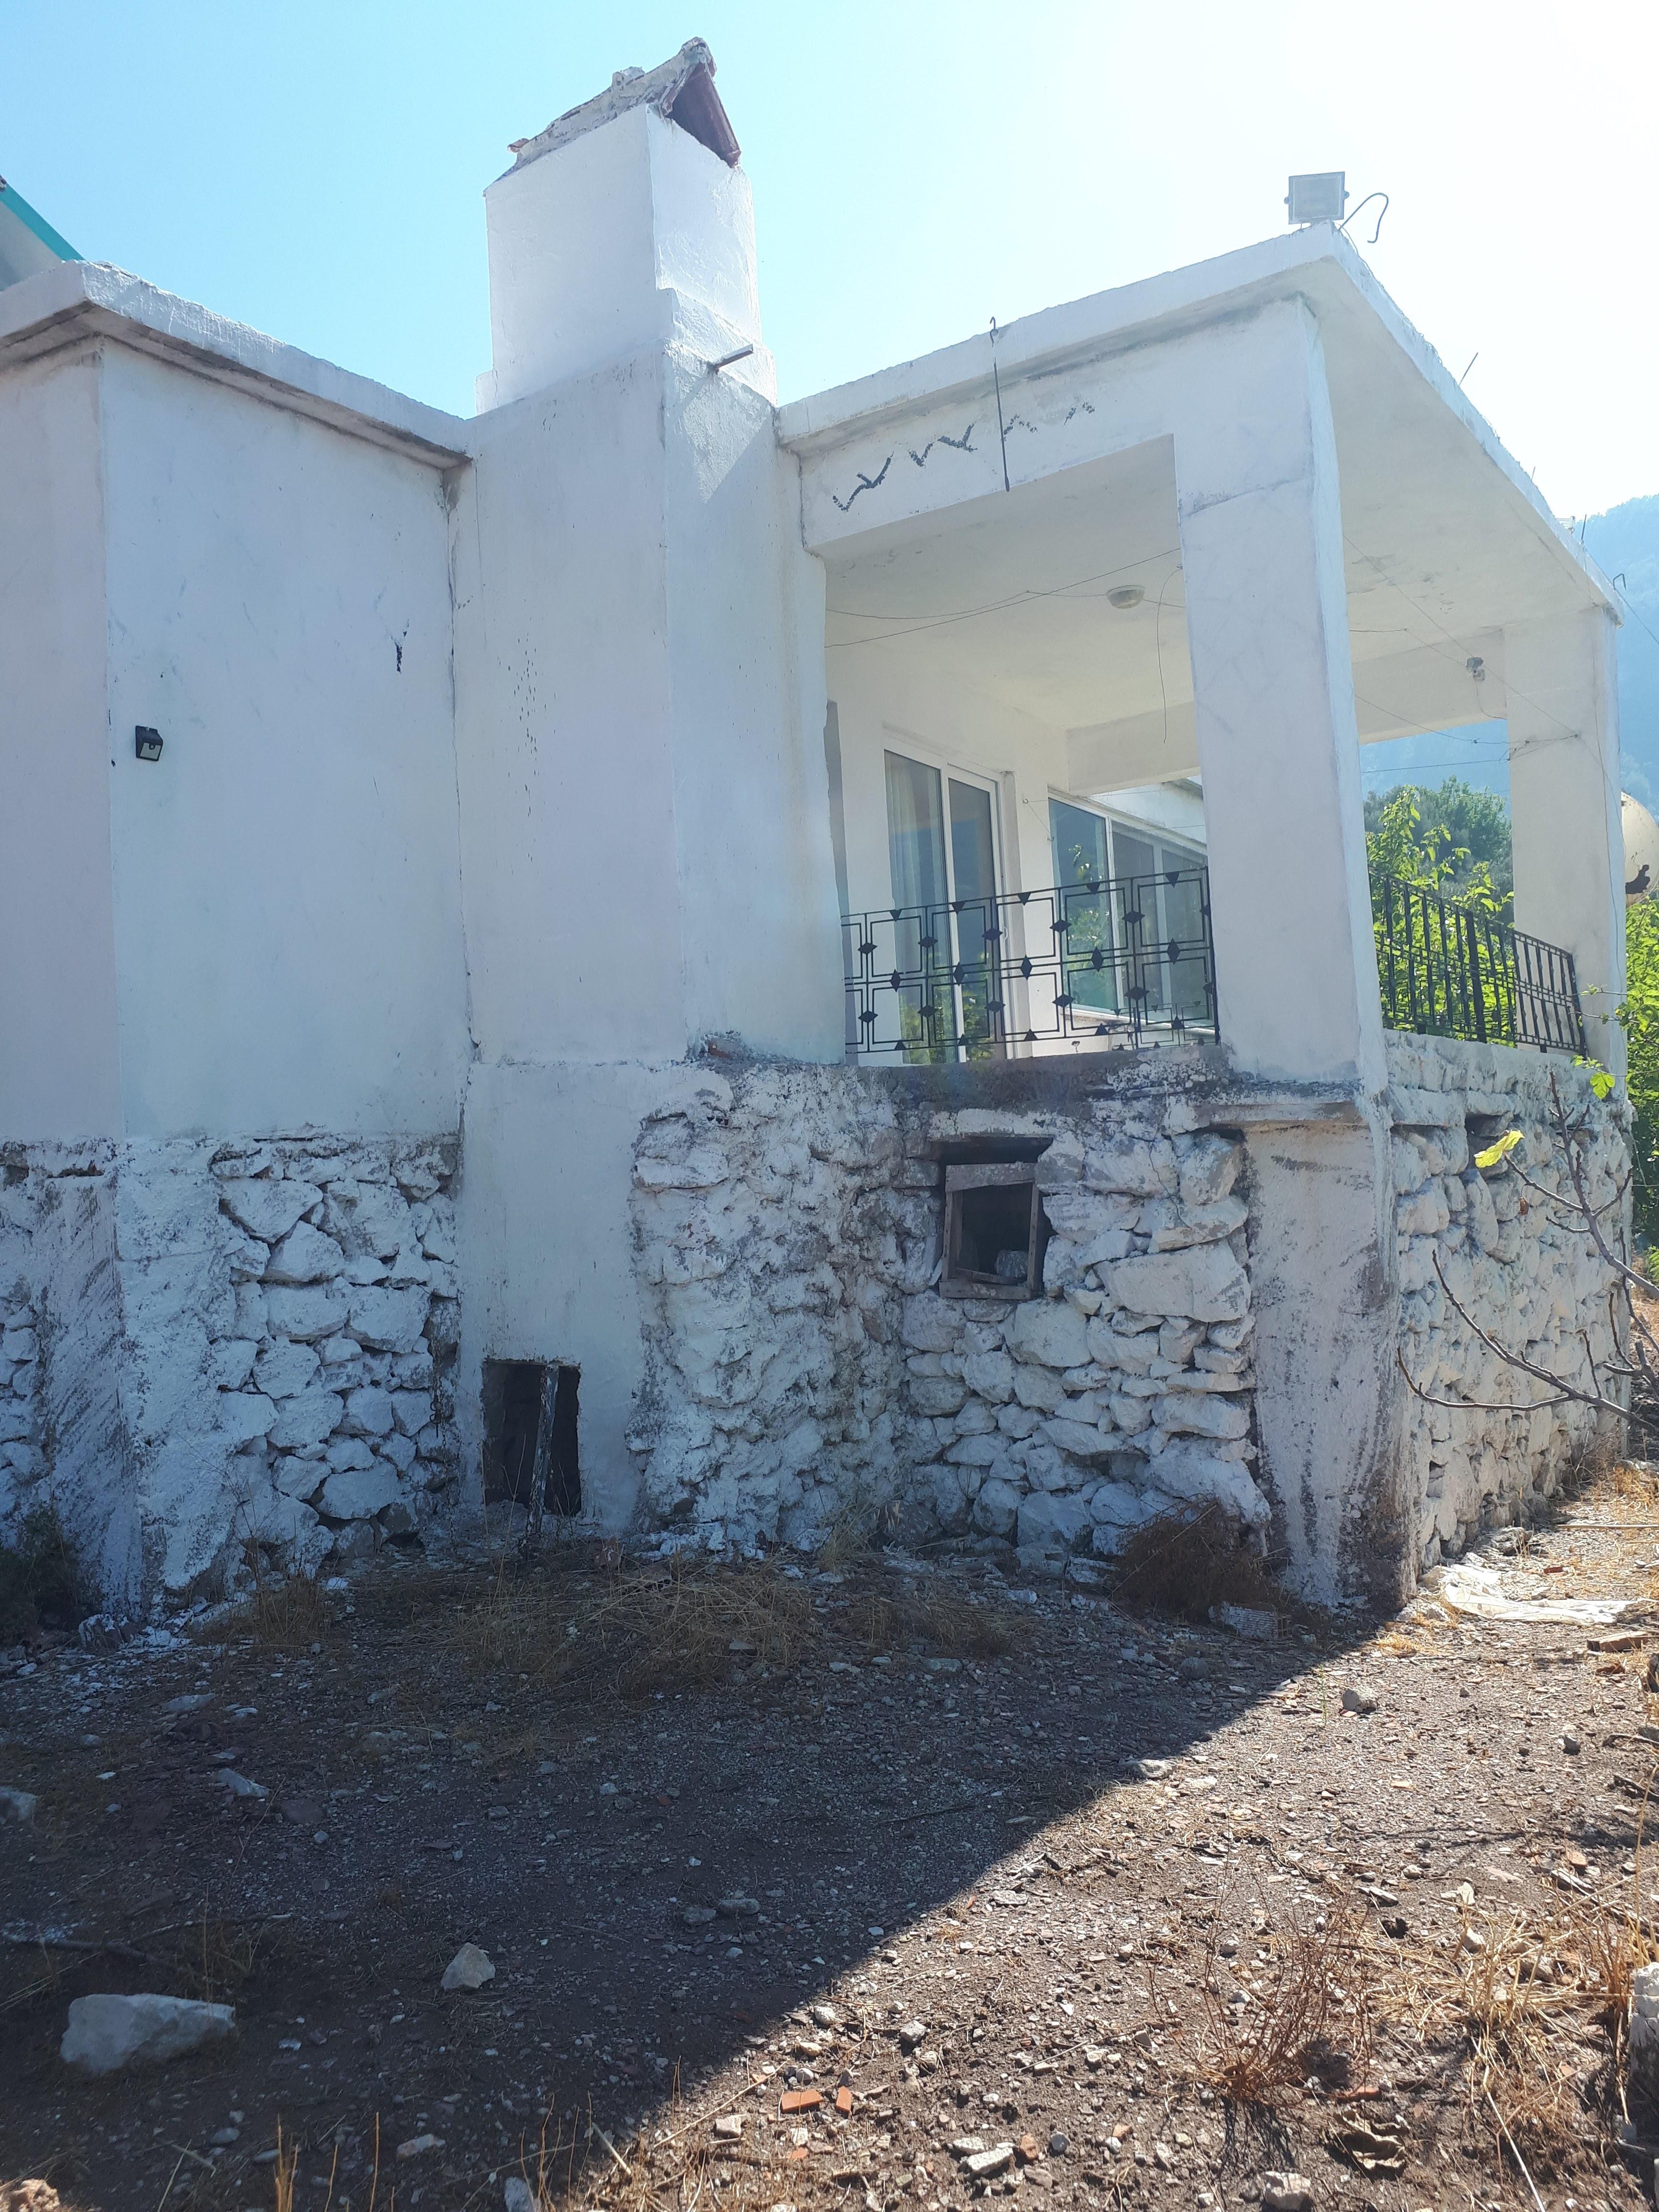 2 bedroomed traditional Turkish house -Fethiye, Ölüdeniz Faralya Kirme area